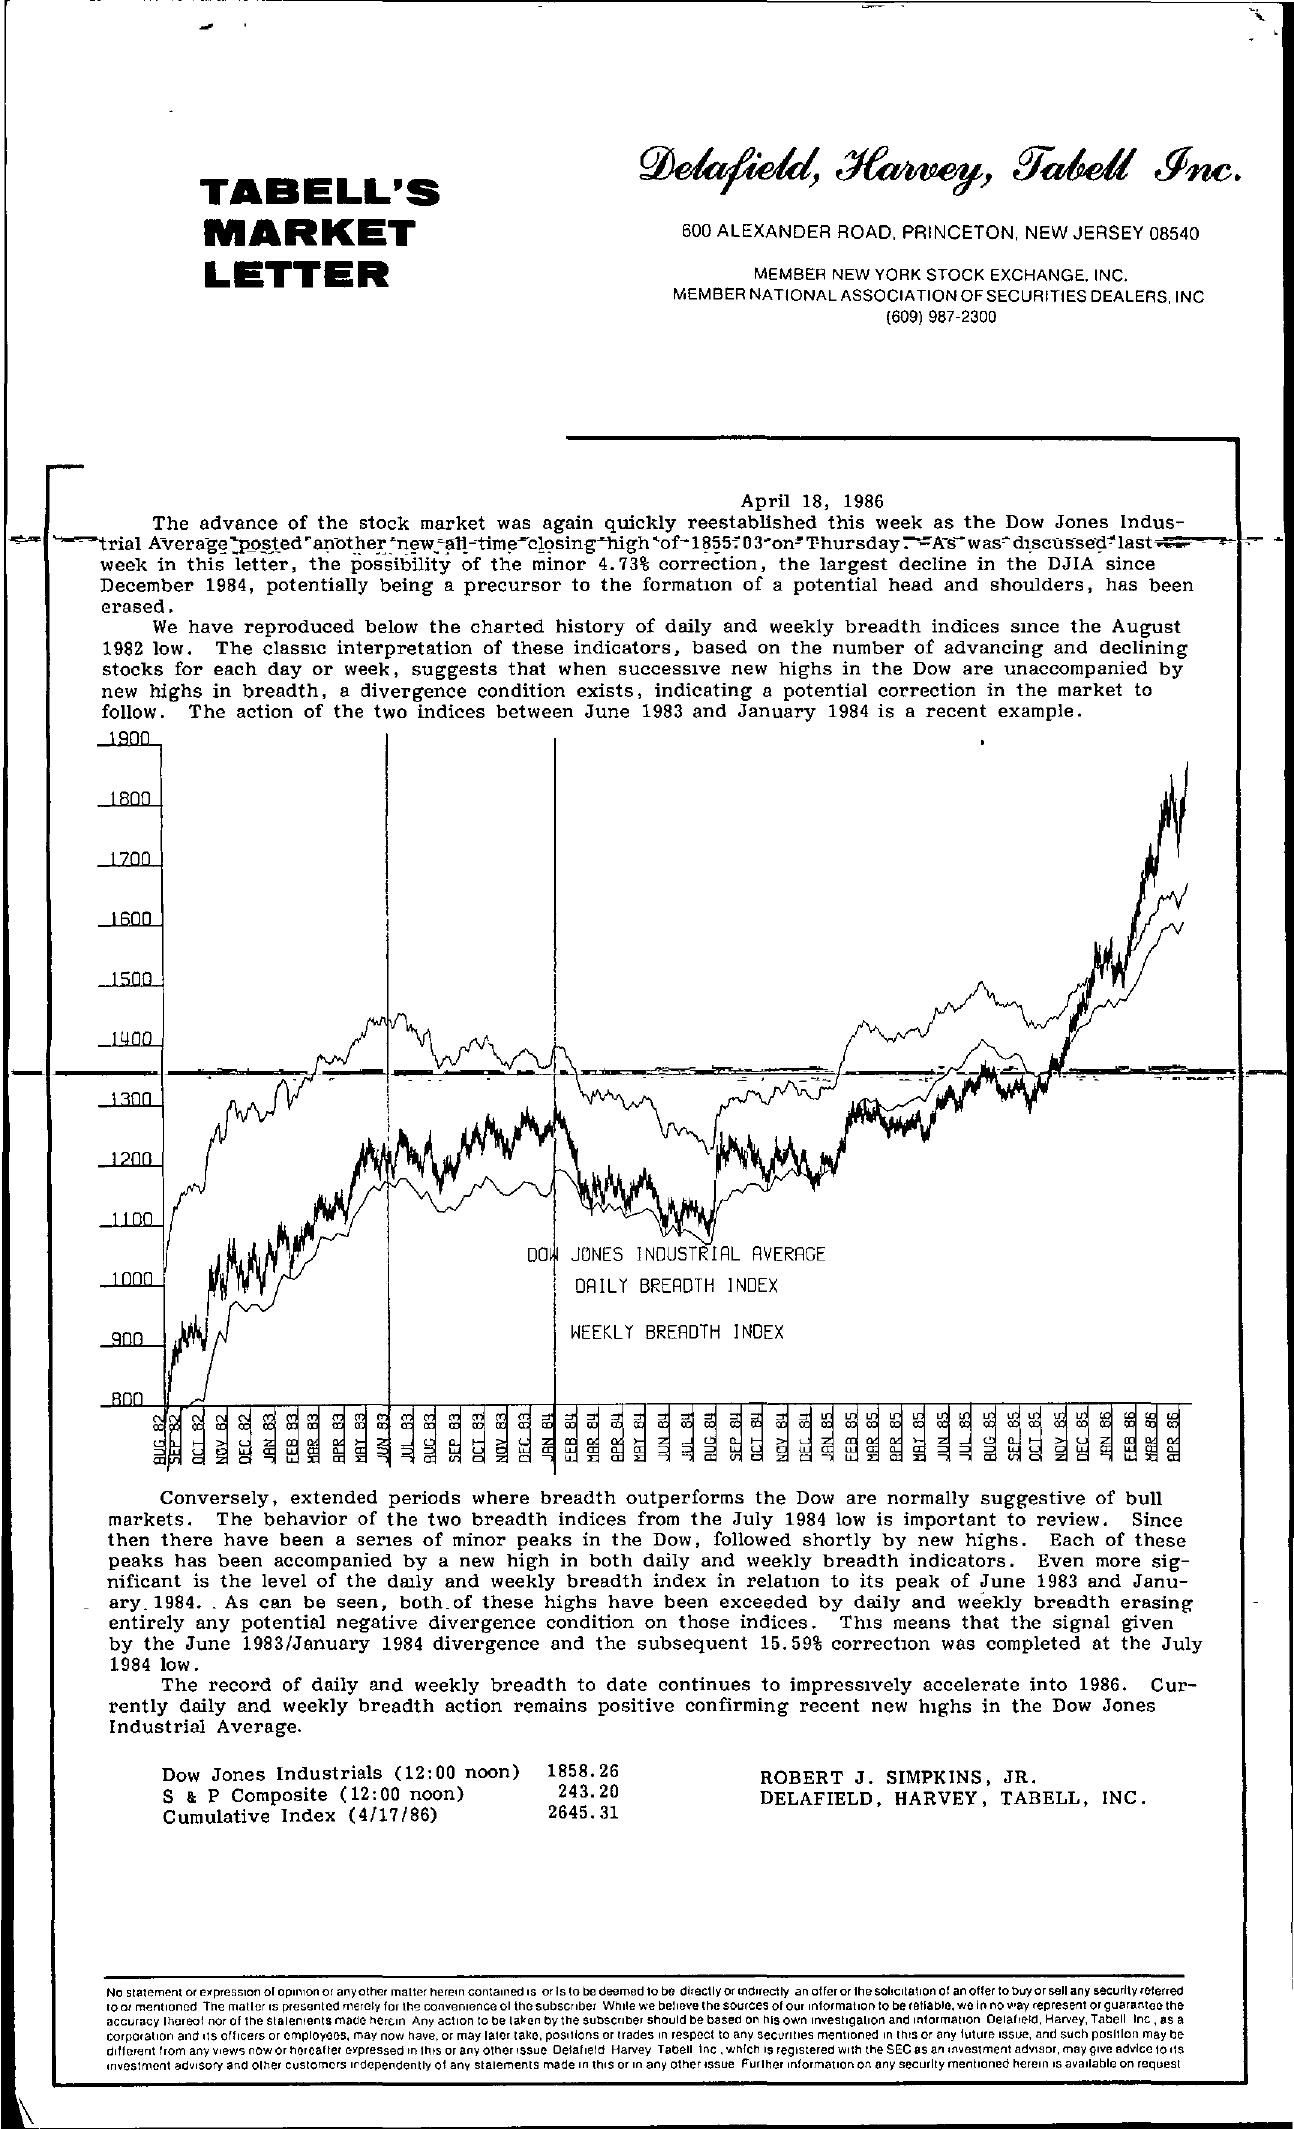 Tabell's Market Letter - April 18, 1986